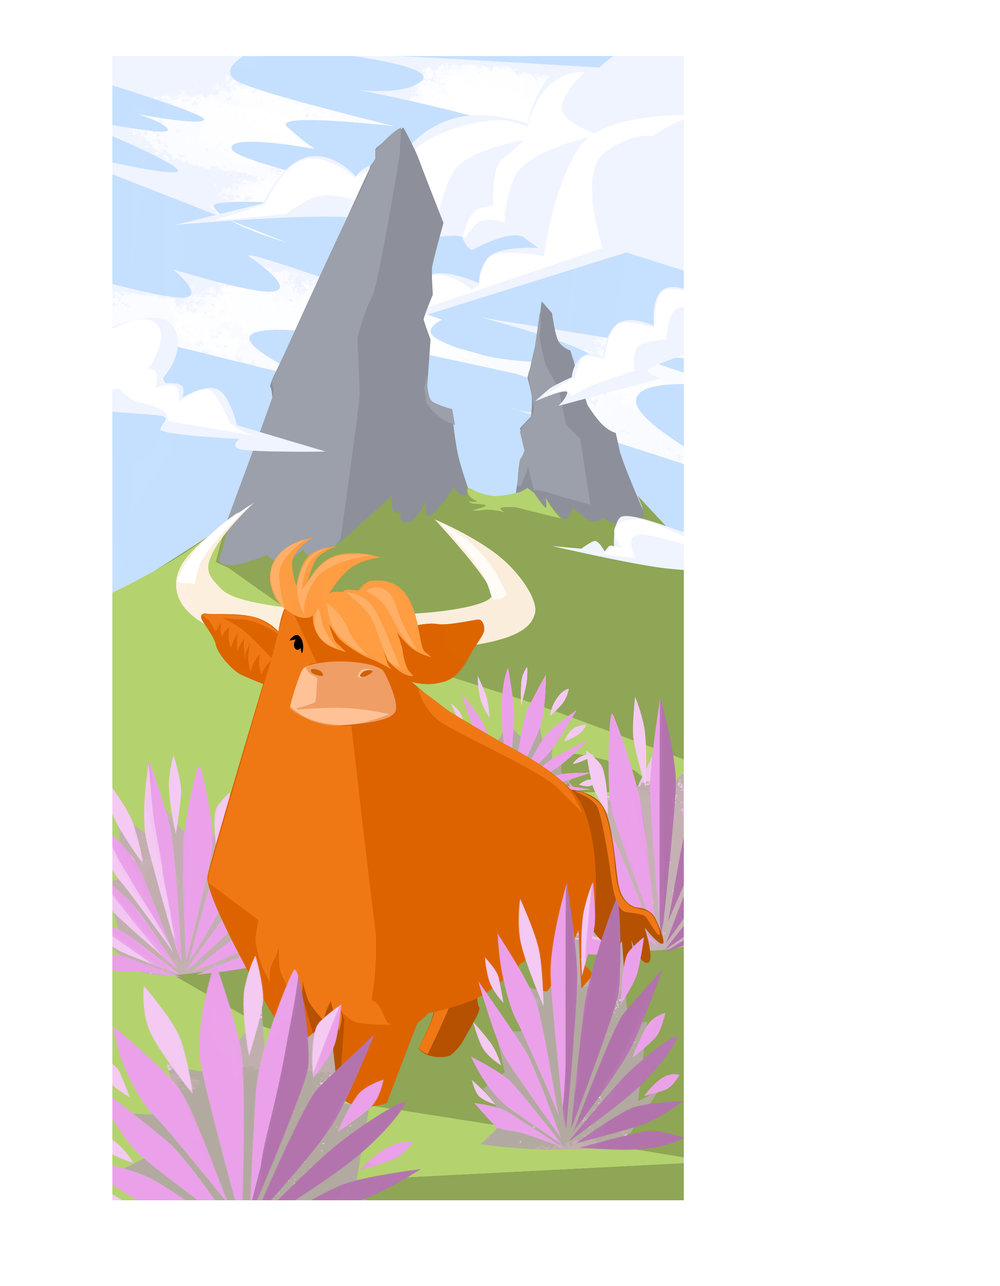 highland_cow_exhibit_v04.jpg